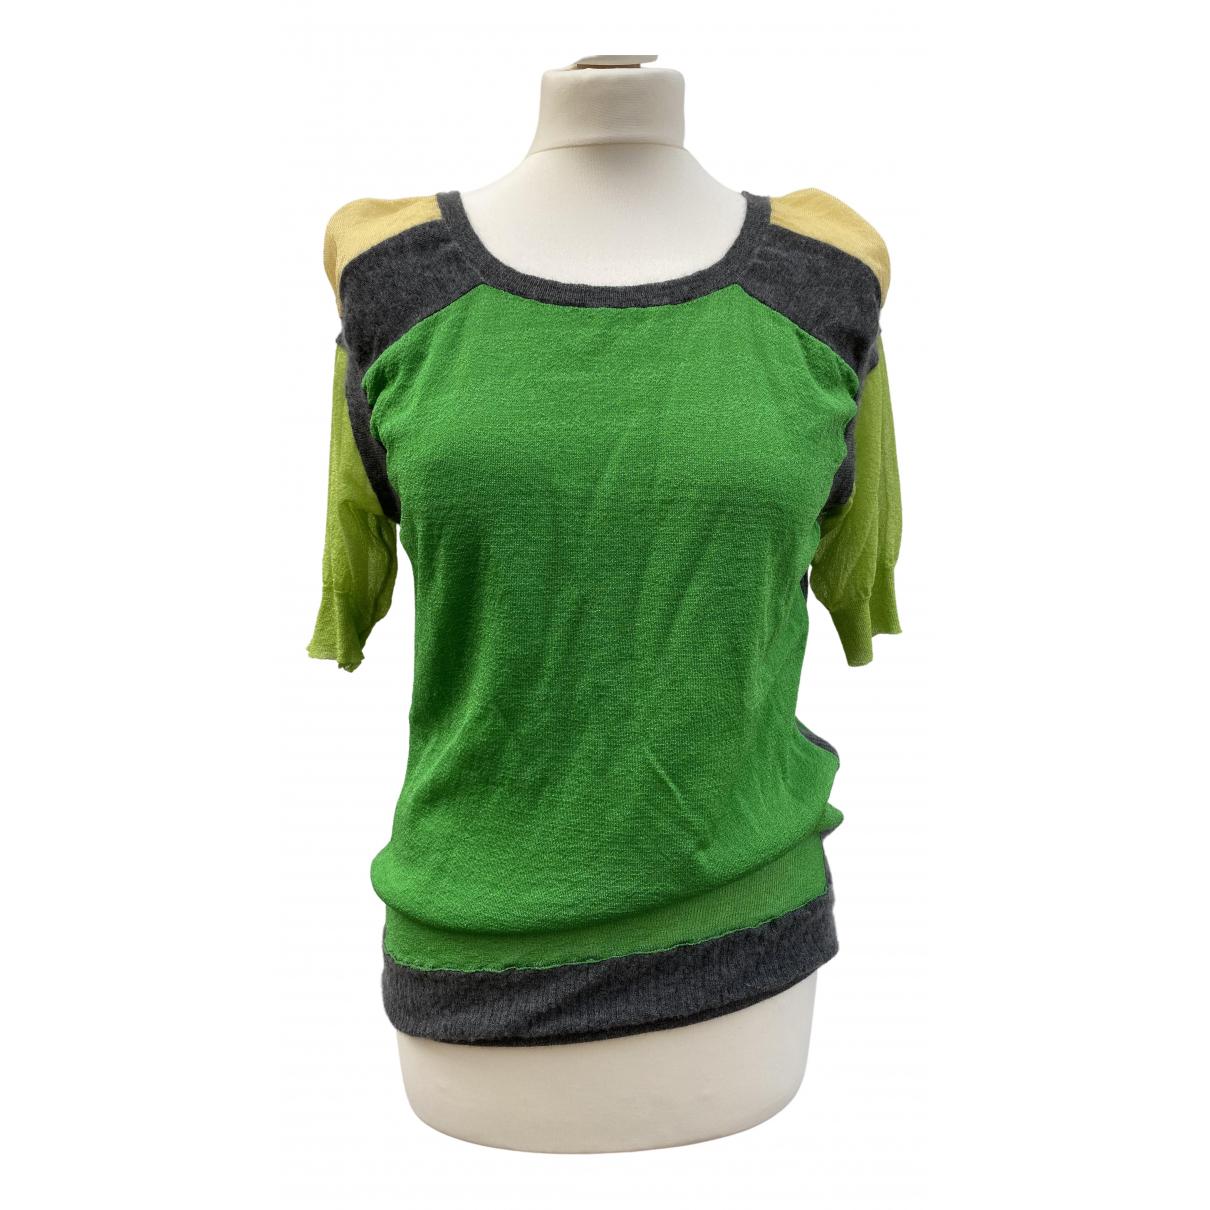 Marni - Top   pour femme - vert